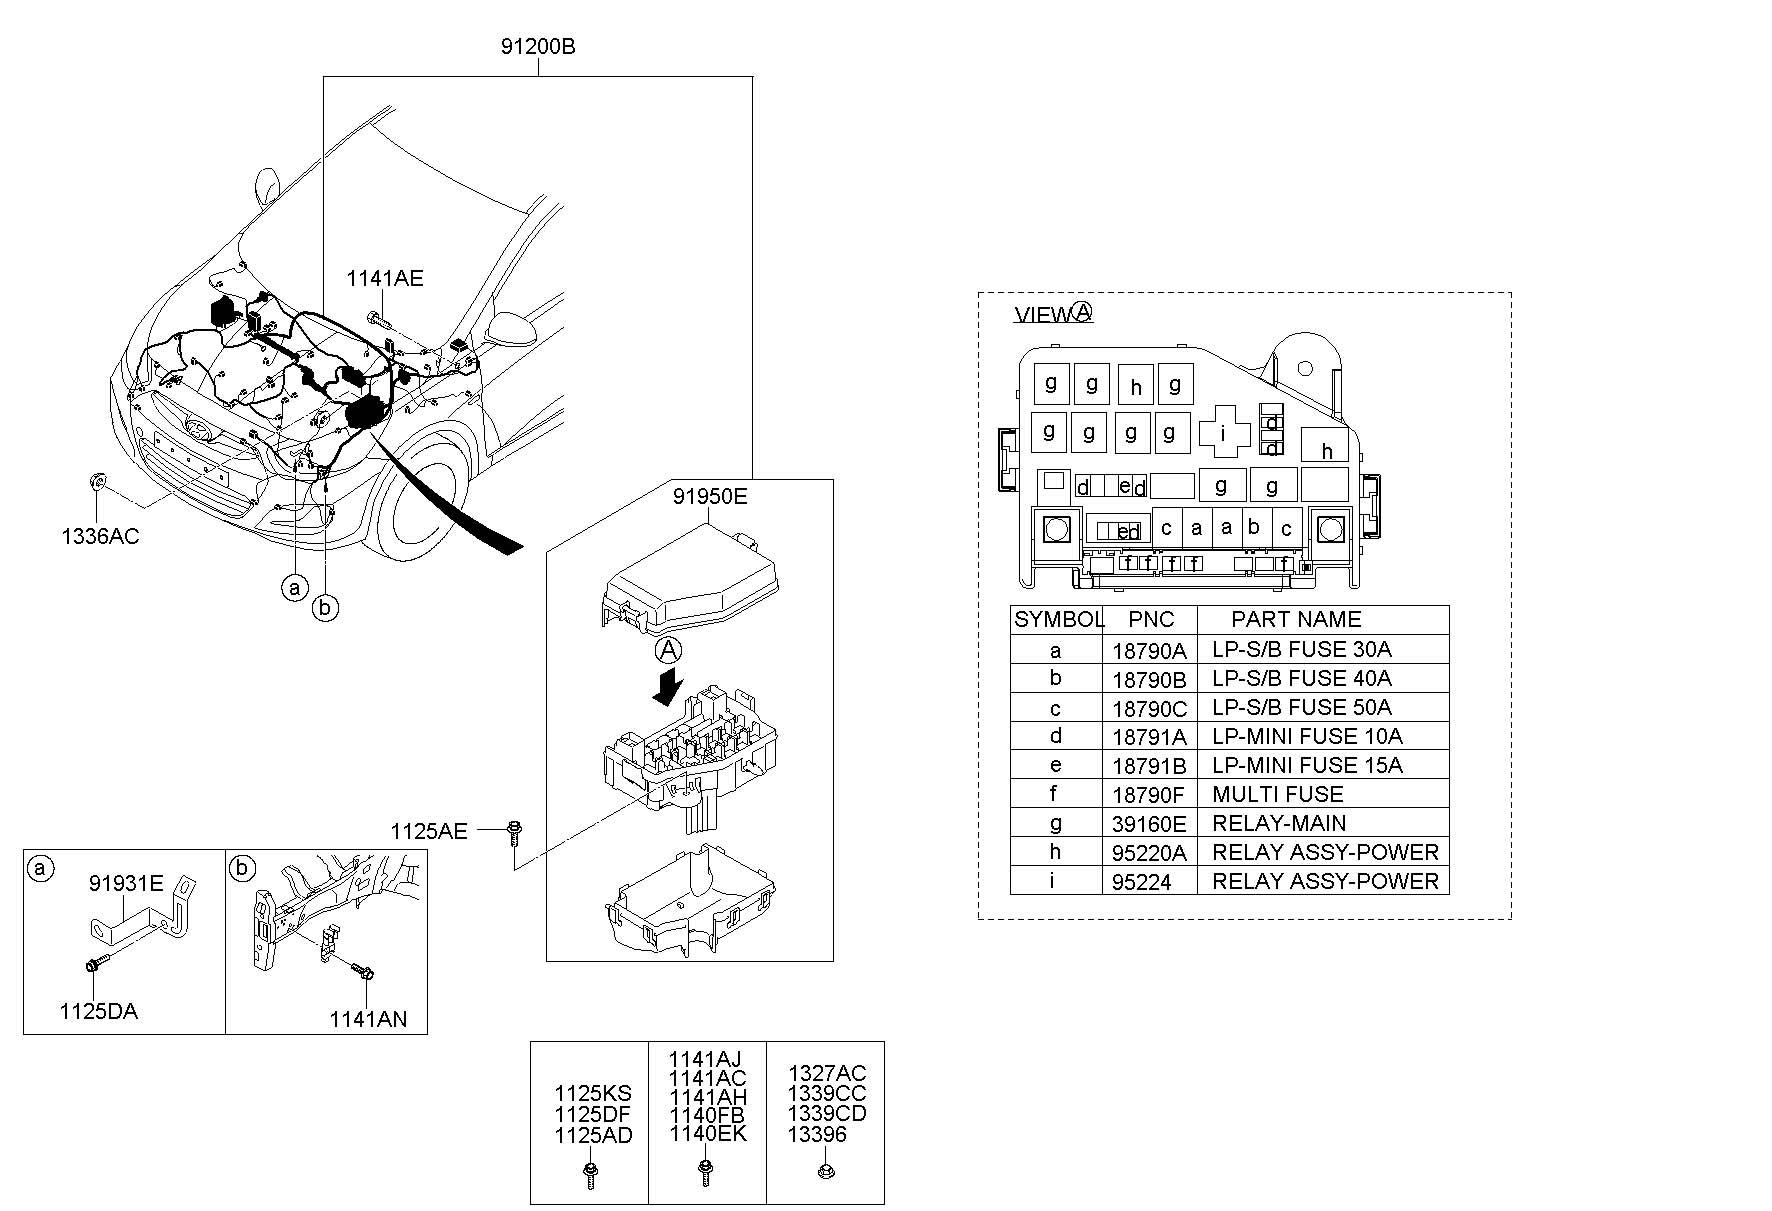 2017 Hyundai Elantra Radio Wiring Diagram Pics